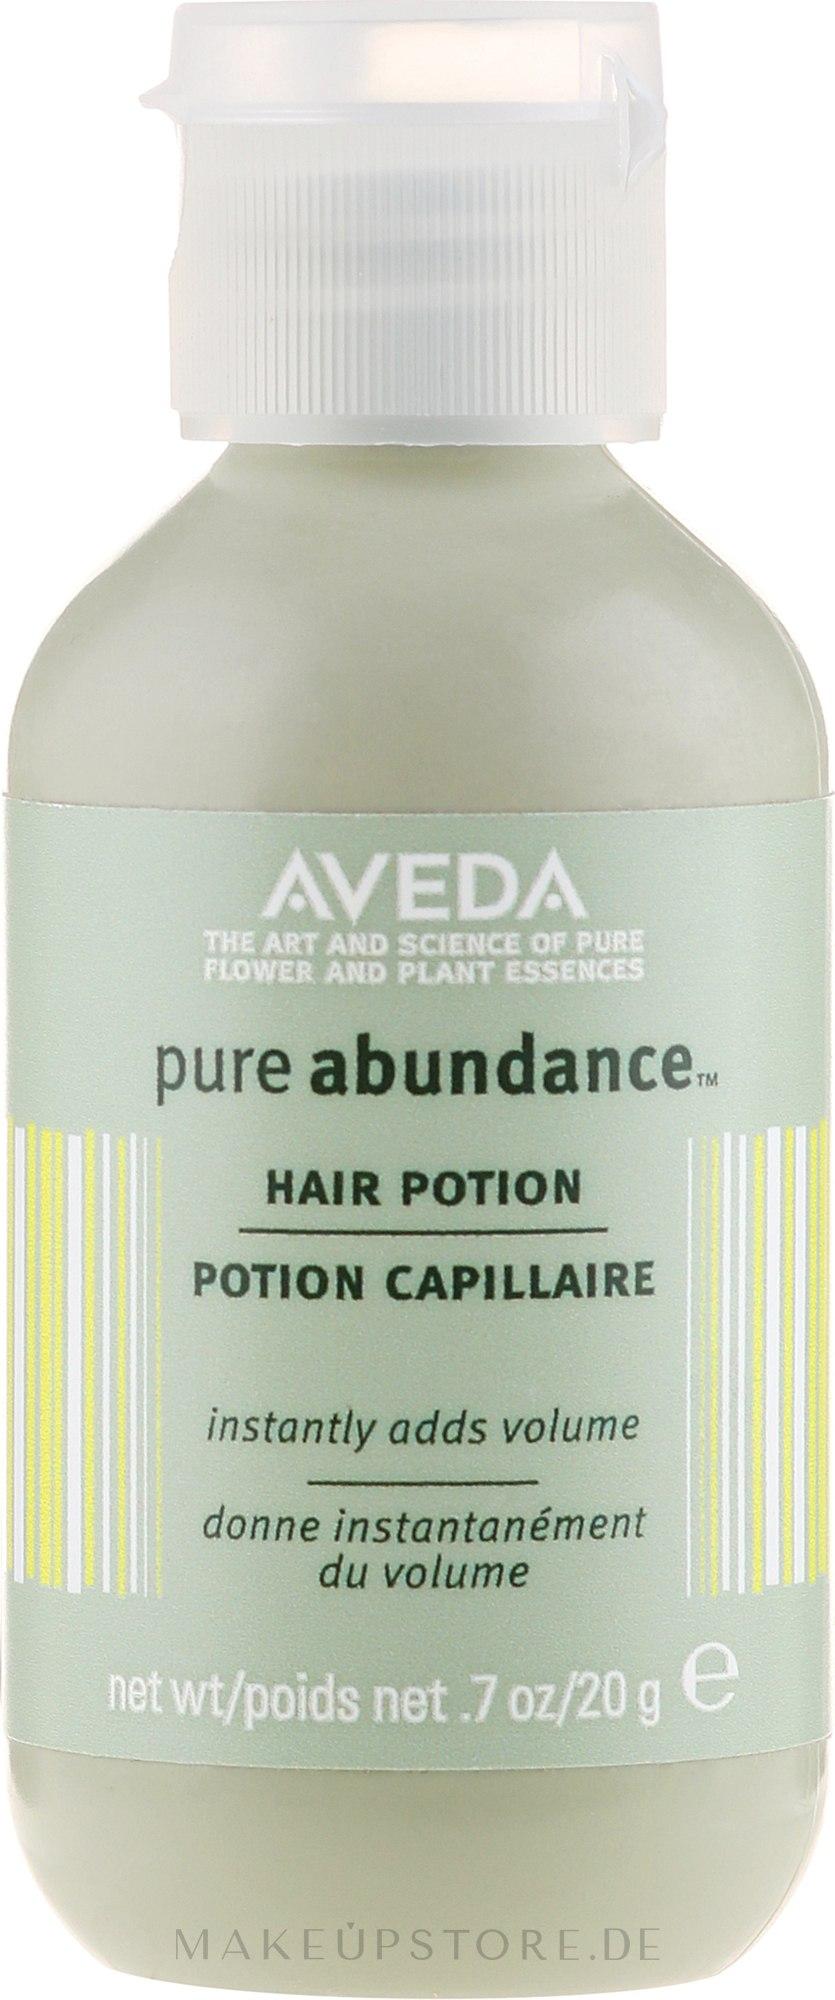 Haarlotion - Aveda Pure Abudance Hair Potion — Bild 20 g